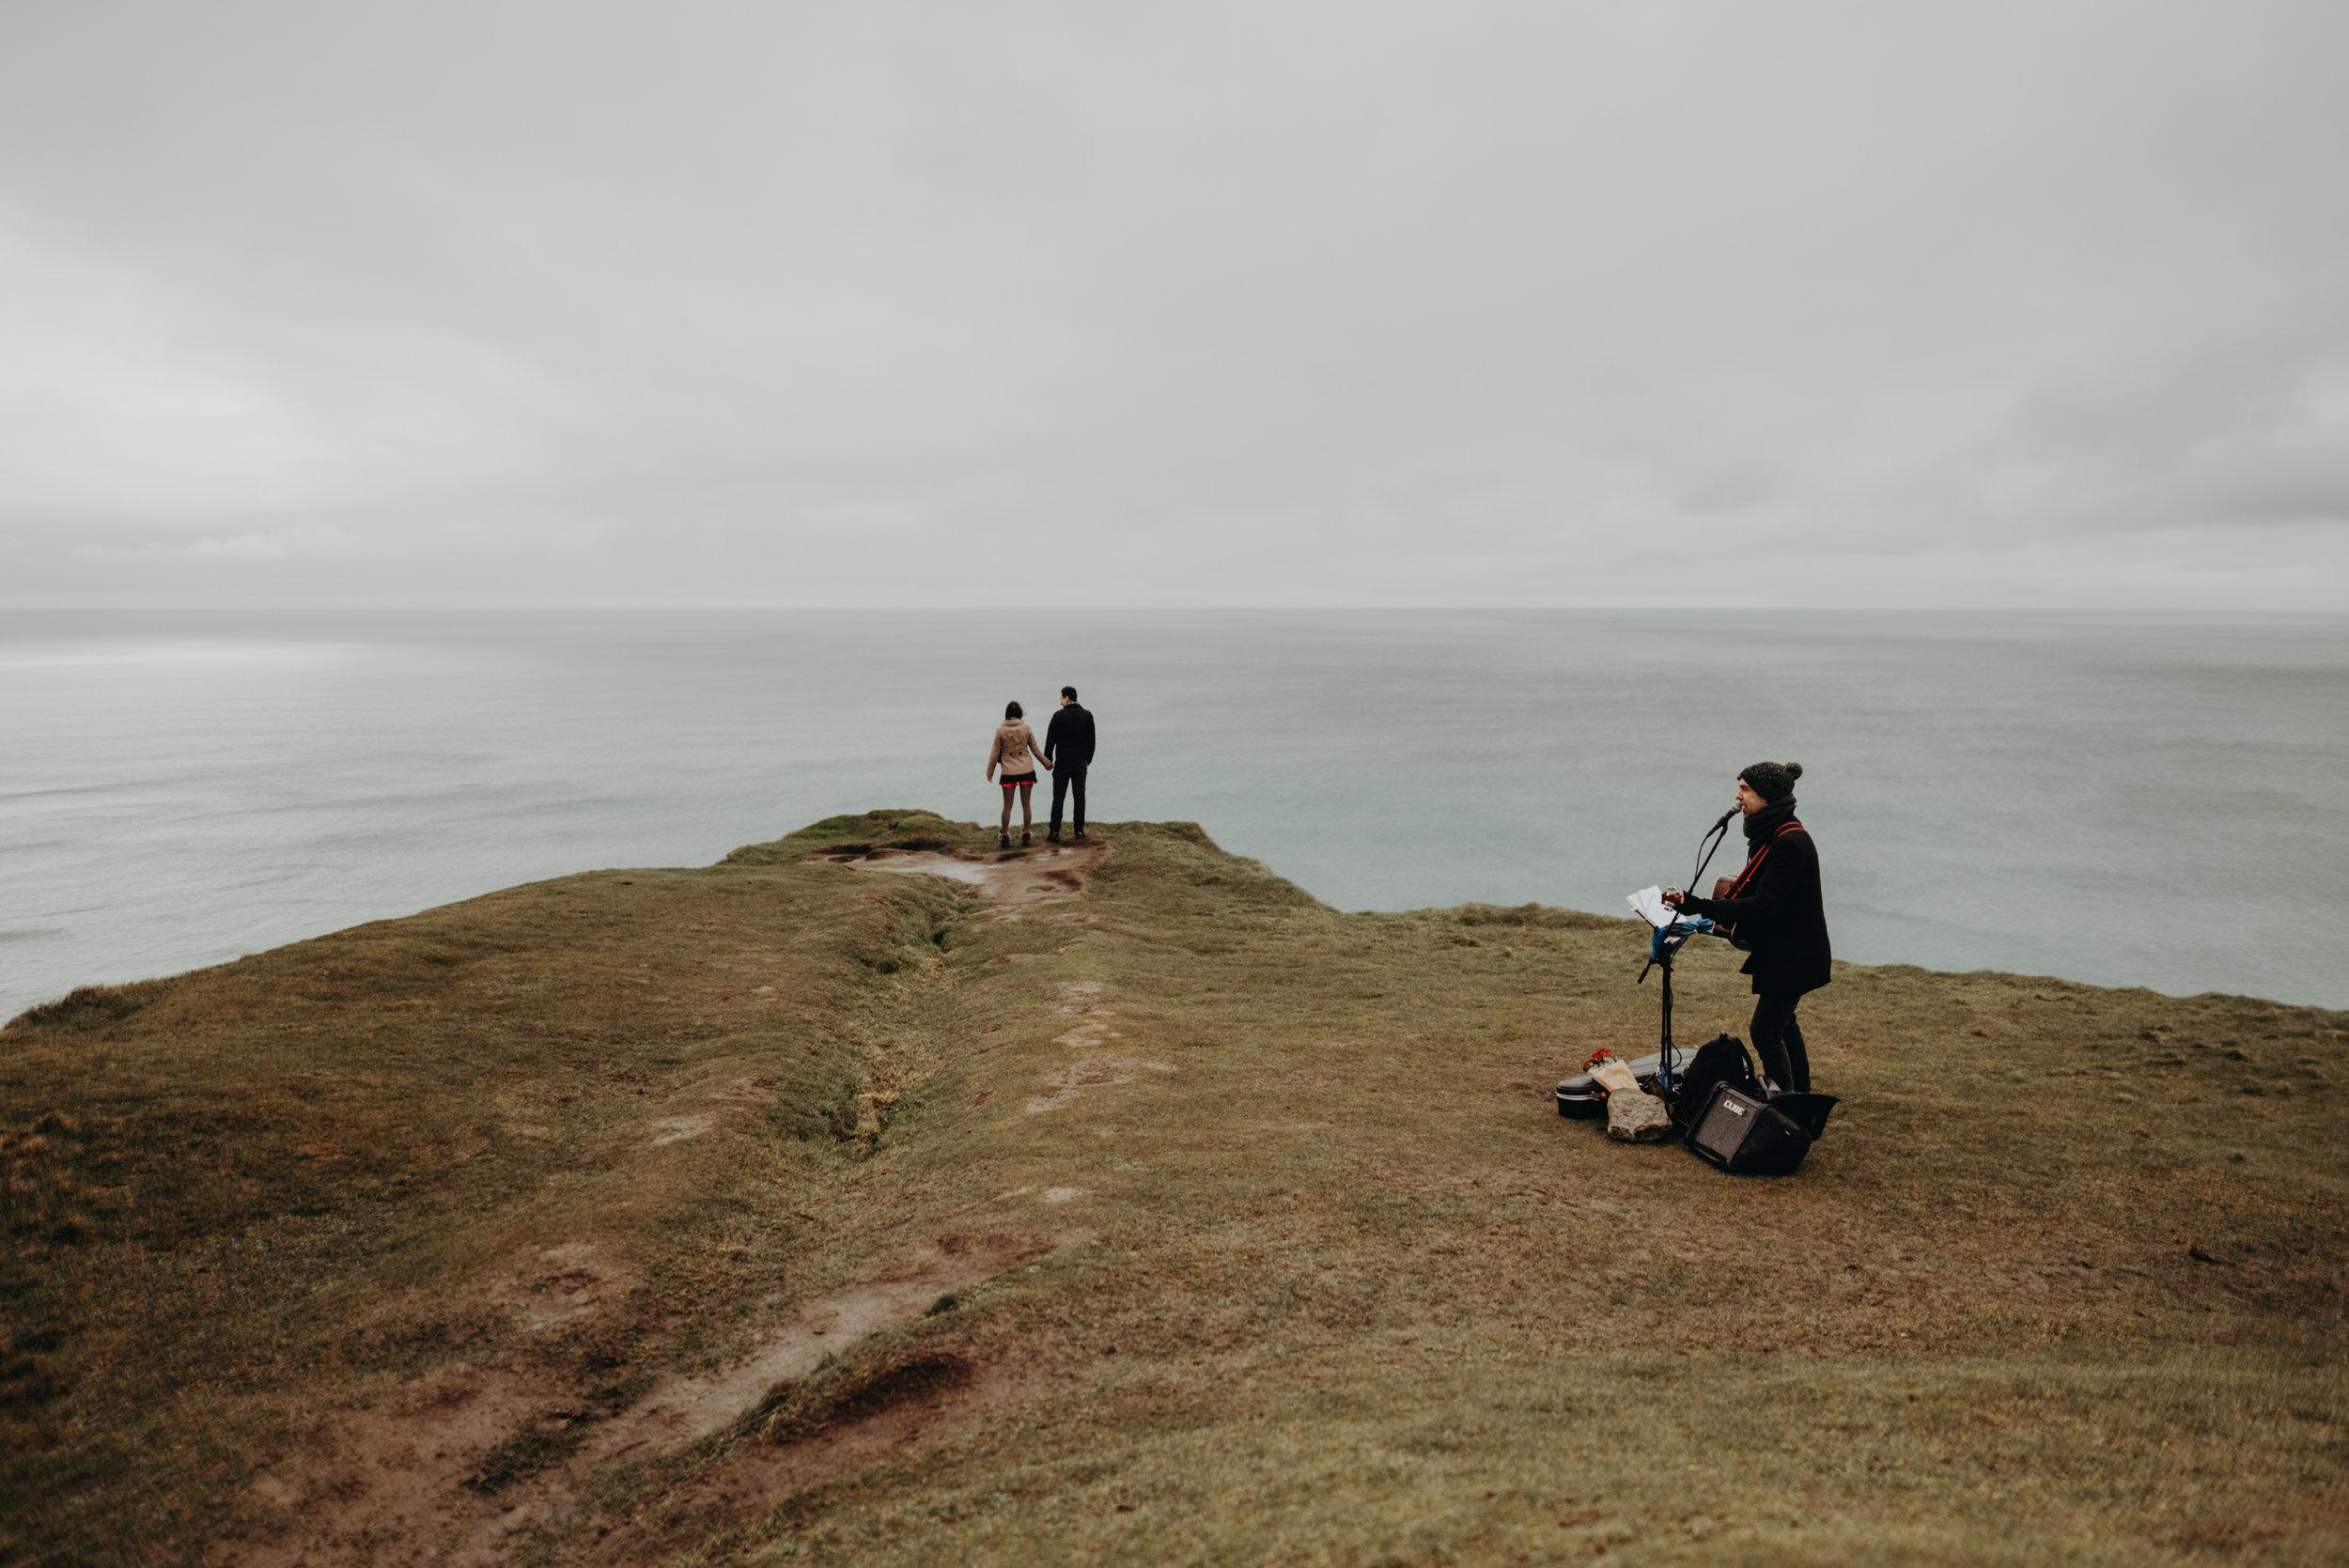 Cliffs Of Moher Engagement Session - Cliffs of Moher Proposal - Cliffs of Mhoer Elopement_5688-Edit-4.jpg